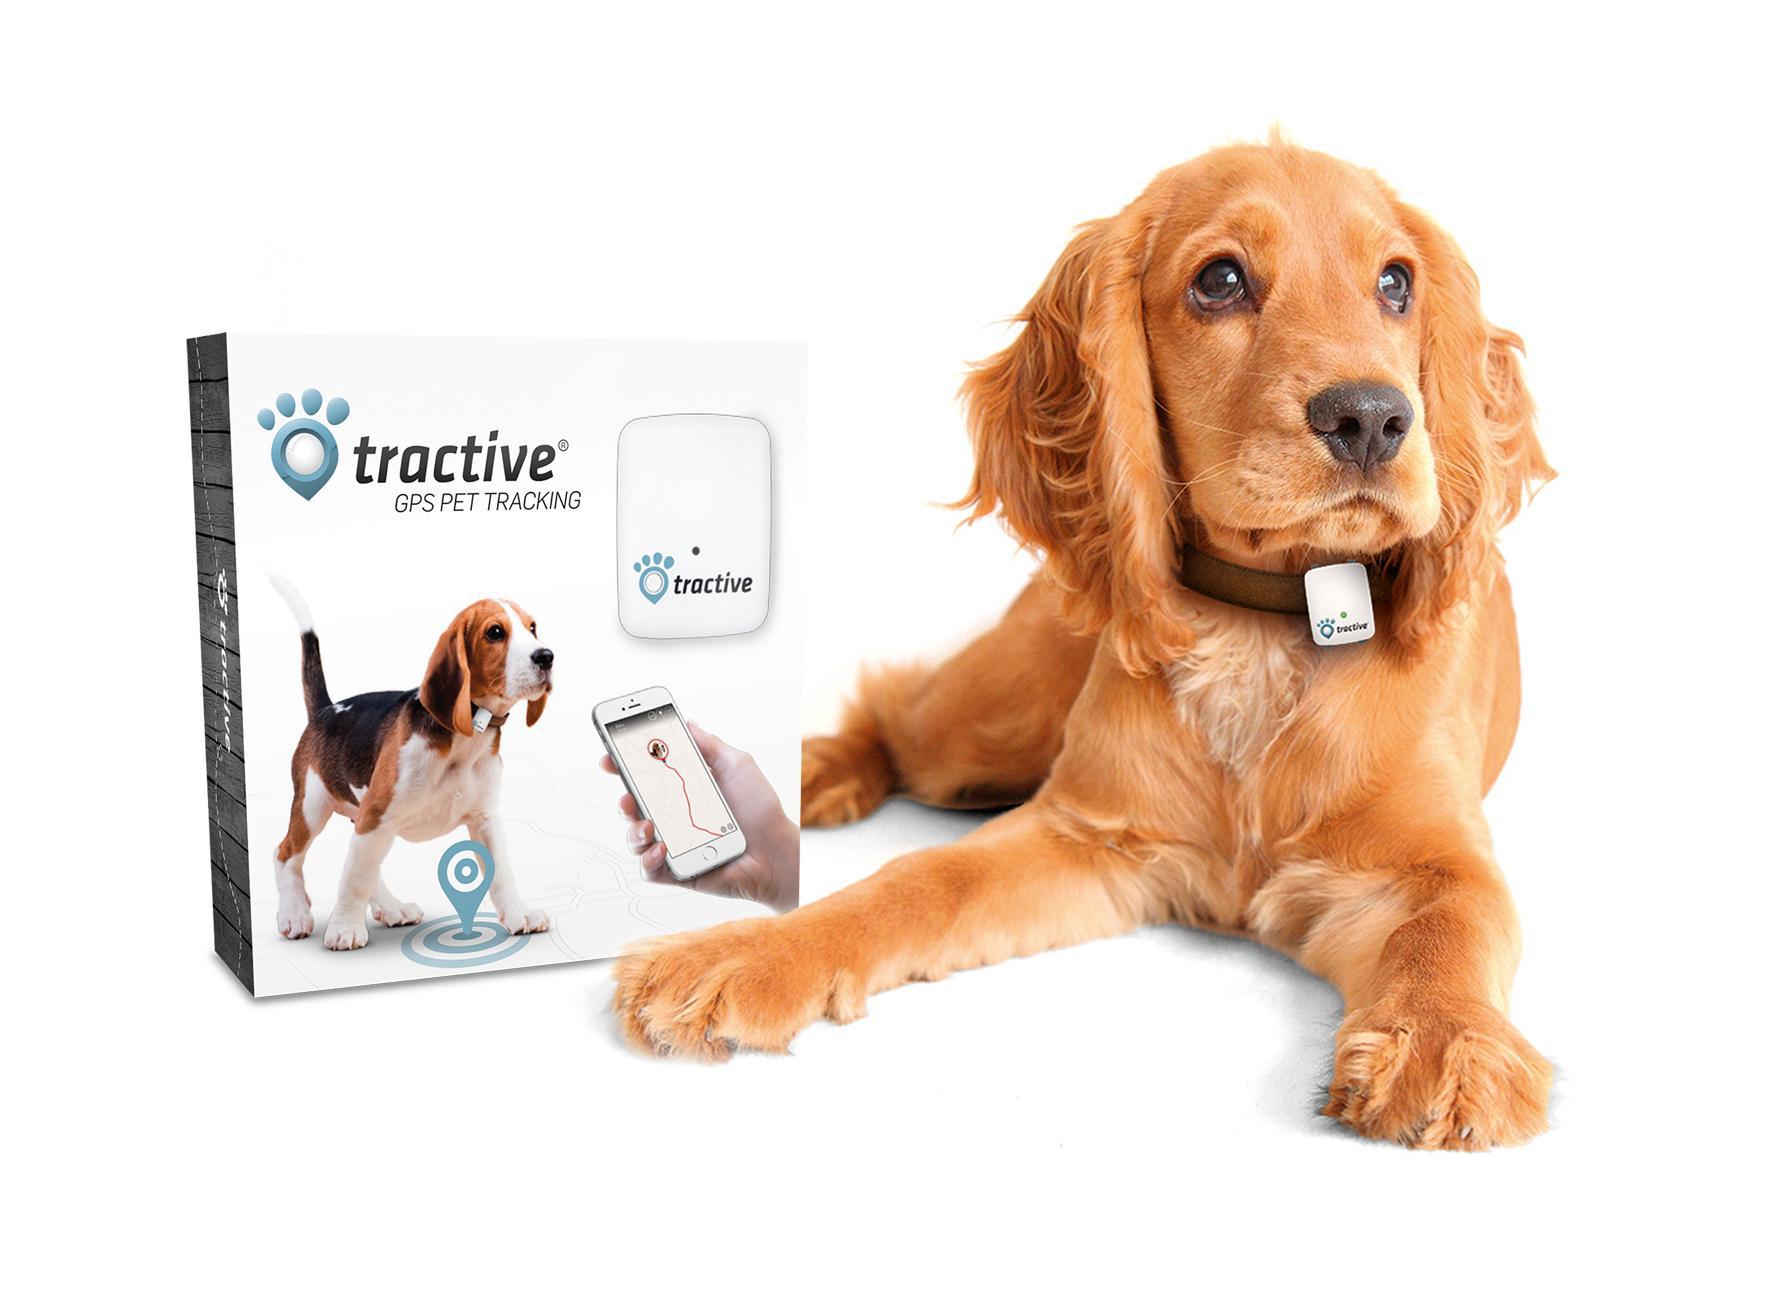 Tractive gps pet tracker pet supplies for Amazon com pillow pets